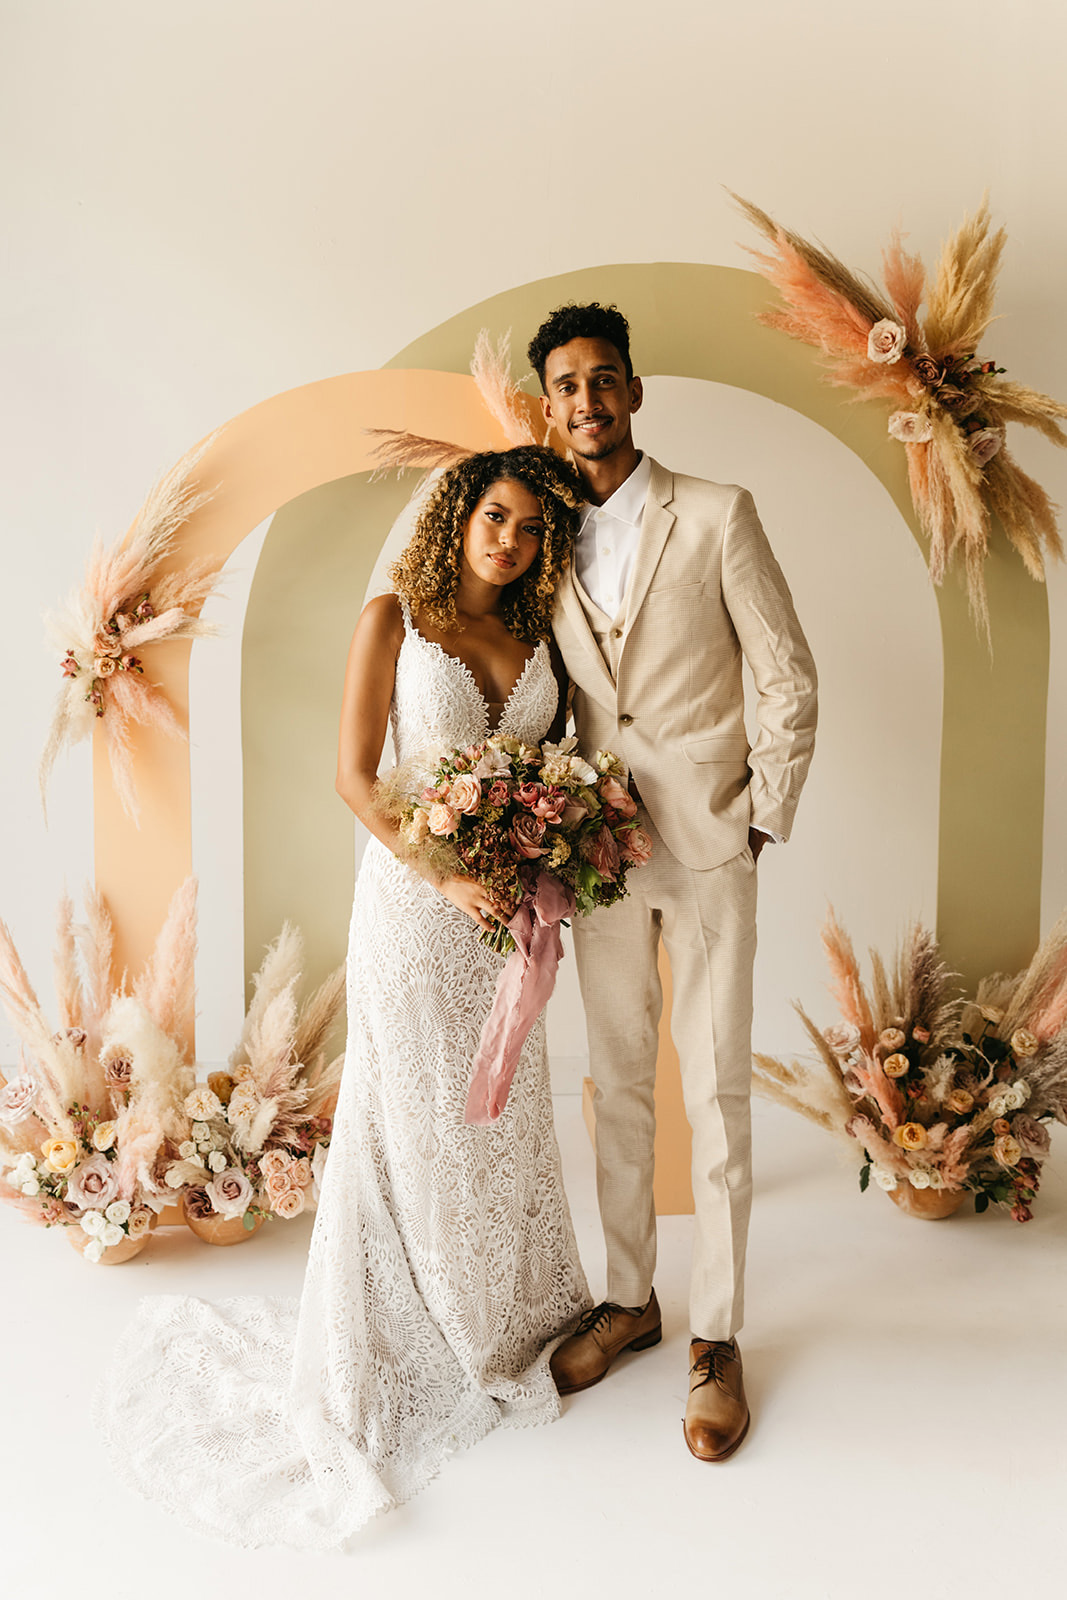 Micro Wedding Ceremony Backdrop